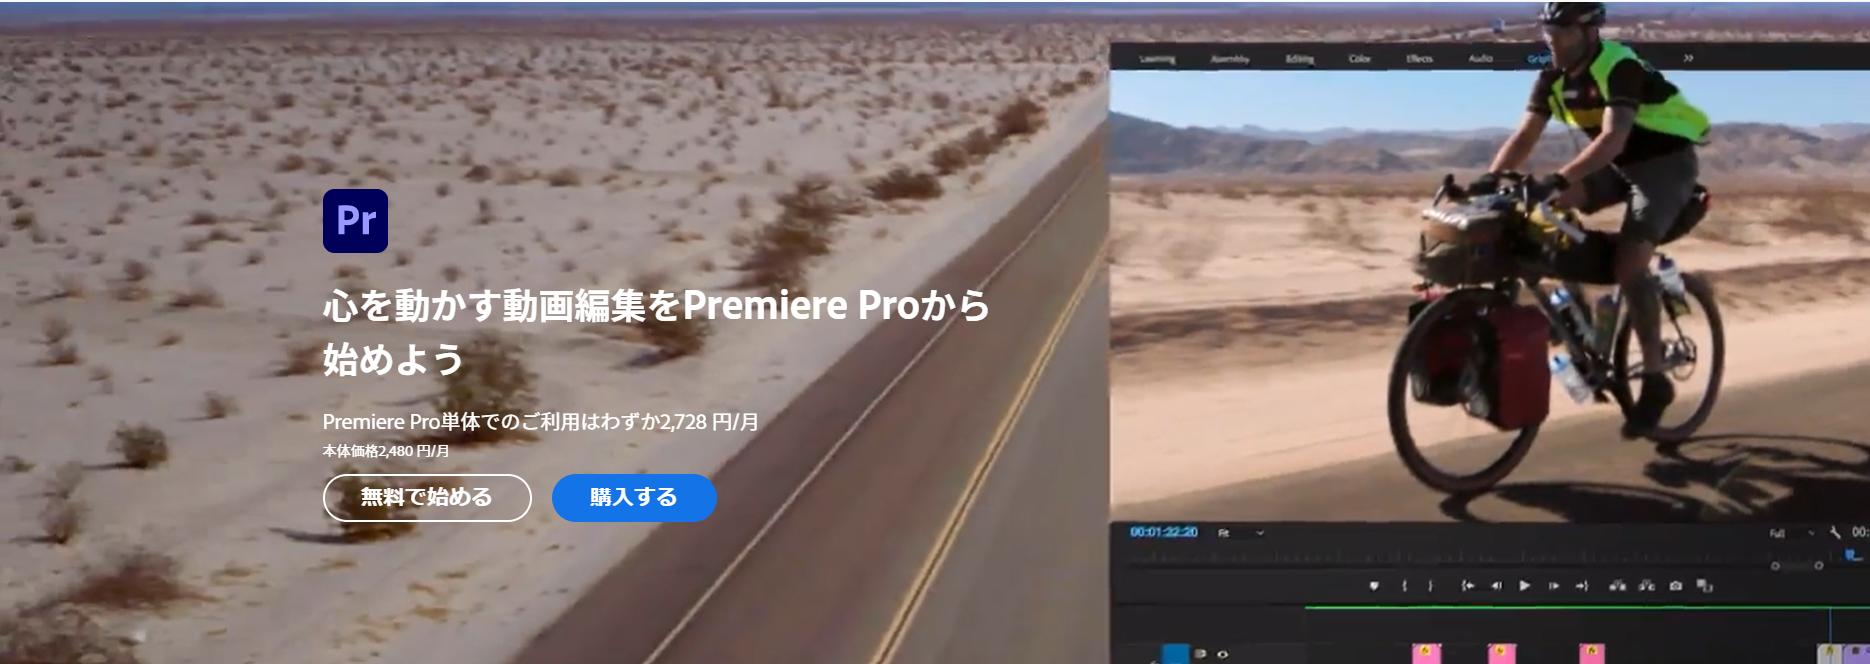 Adobe Premiere Proサービスサイト キャプチャ